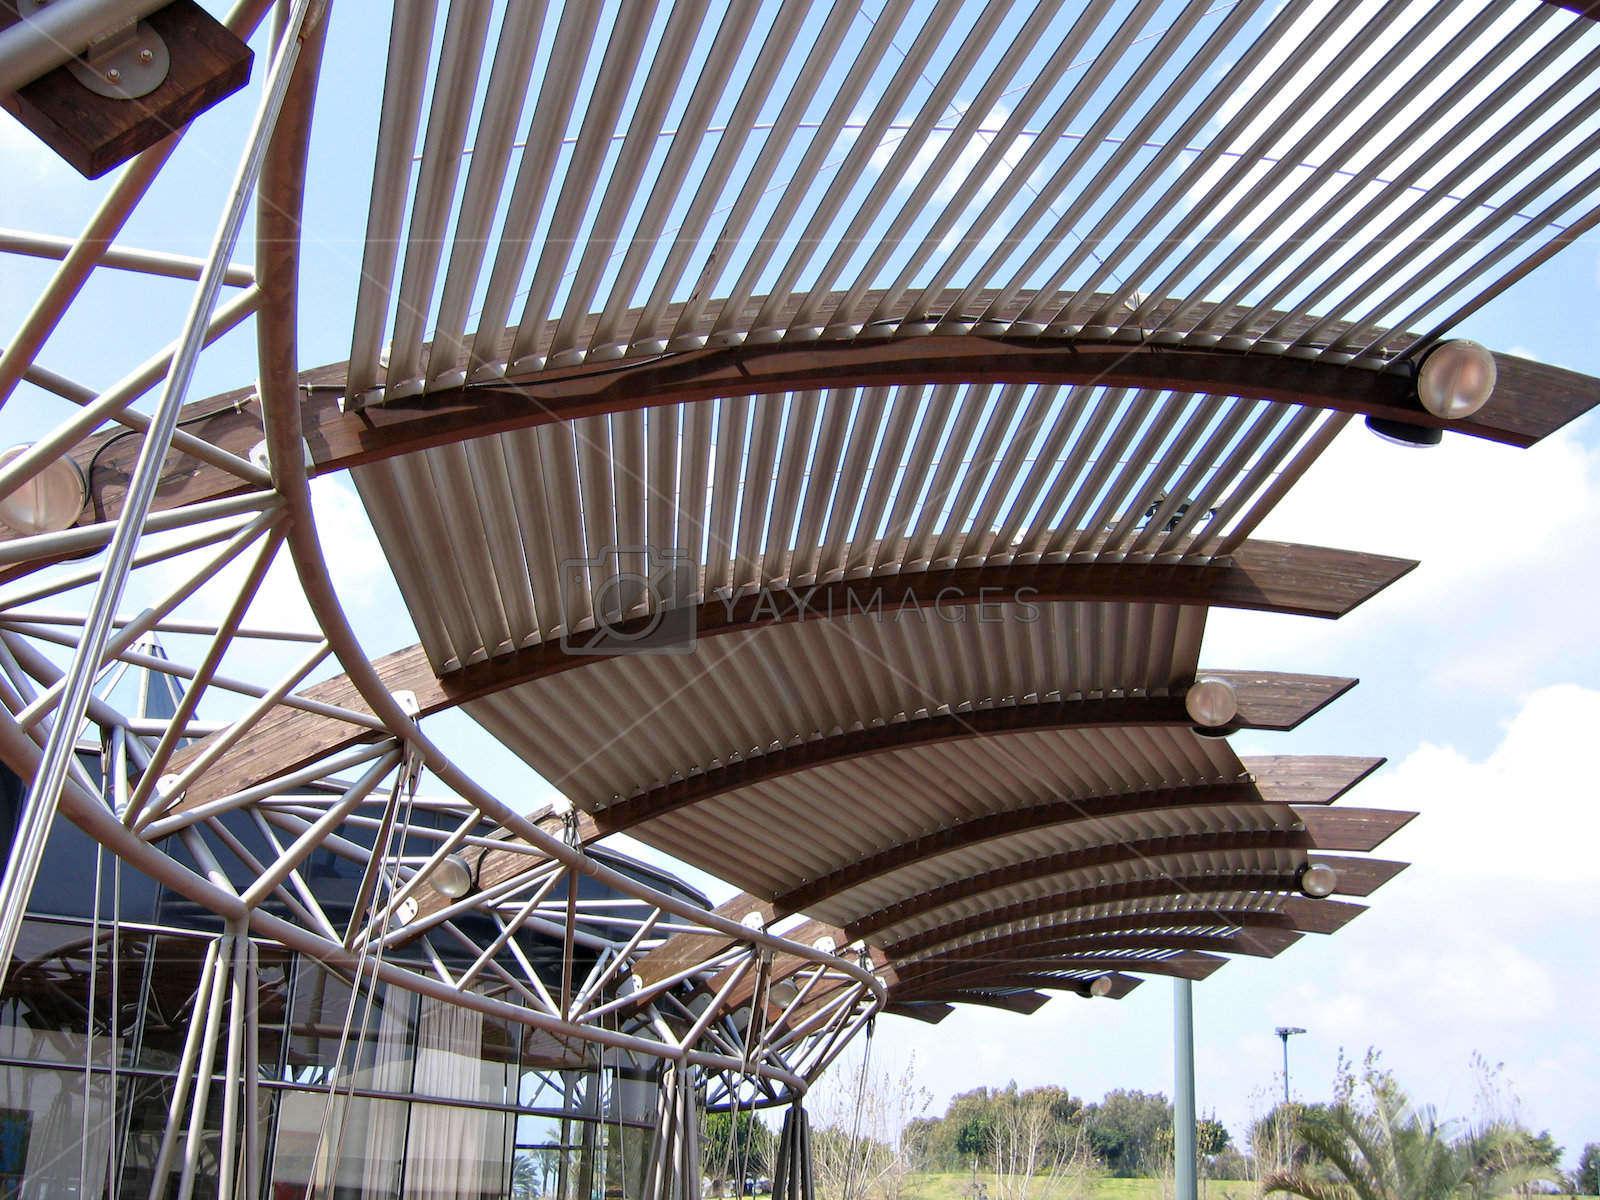 Full Size of Pergola Modern Metal Architecture Contemporary Design Ideas Kits Uk Designs With Glass Pergolas Modernas Para Terrazas Holz Selber Bauen Moderna Madera Wohnzimmer Pergola Modern